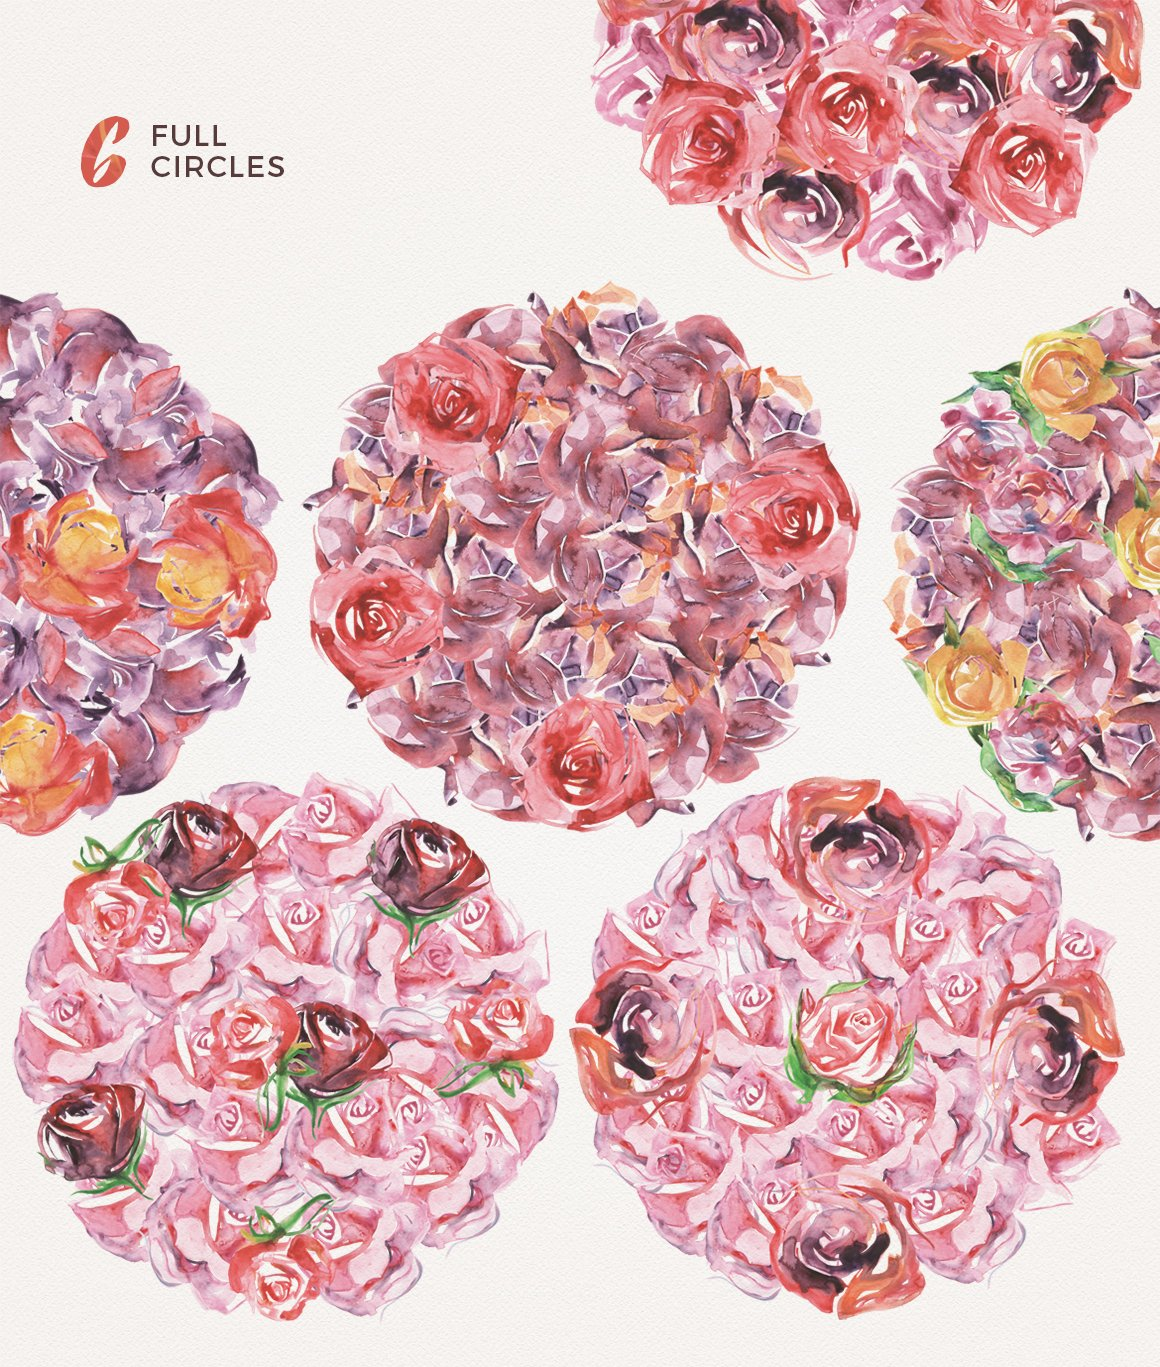 高清手绘花卉树叶水彩剪贴画PNG免抠图片素材 Watercolor Handmade Design Bundle插图(5)